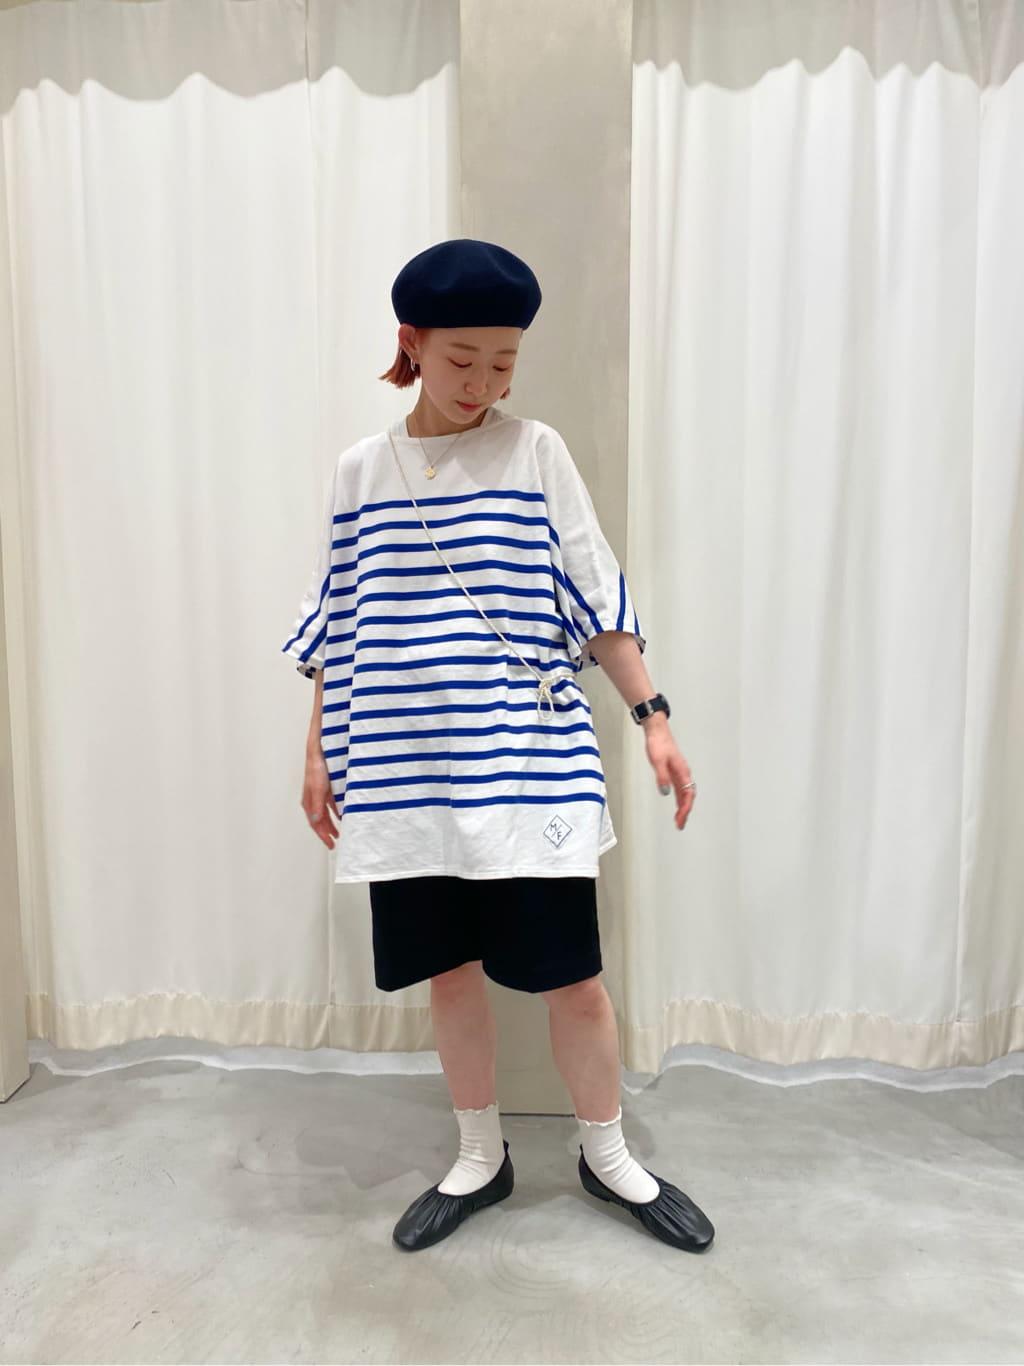 - CHILD WOMAN CHILD WOMAN , PAR ICI 東京スカイツリータウン・ソラマチ 身長:150cm 2021.08.05